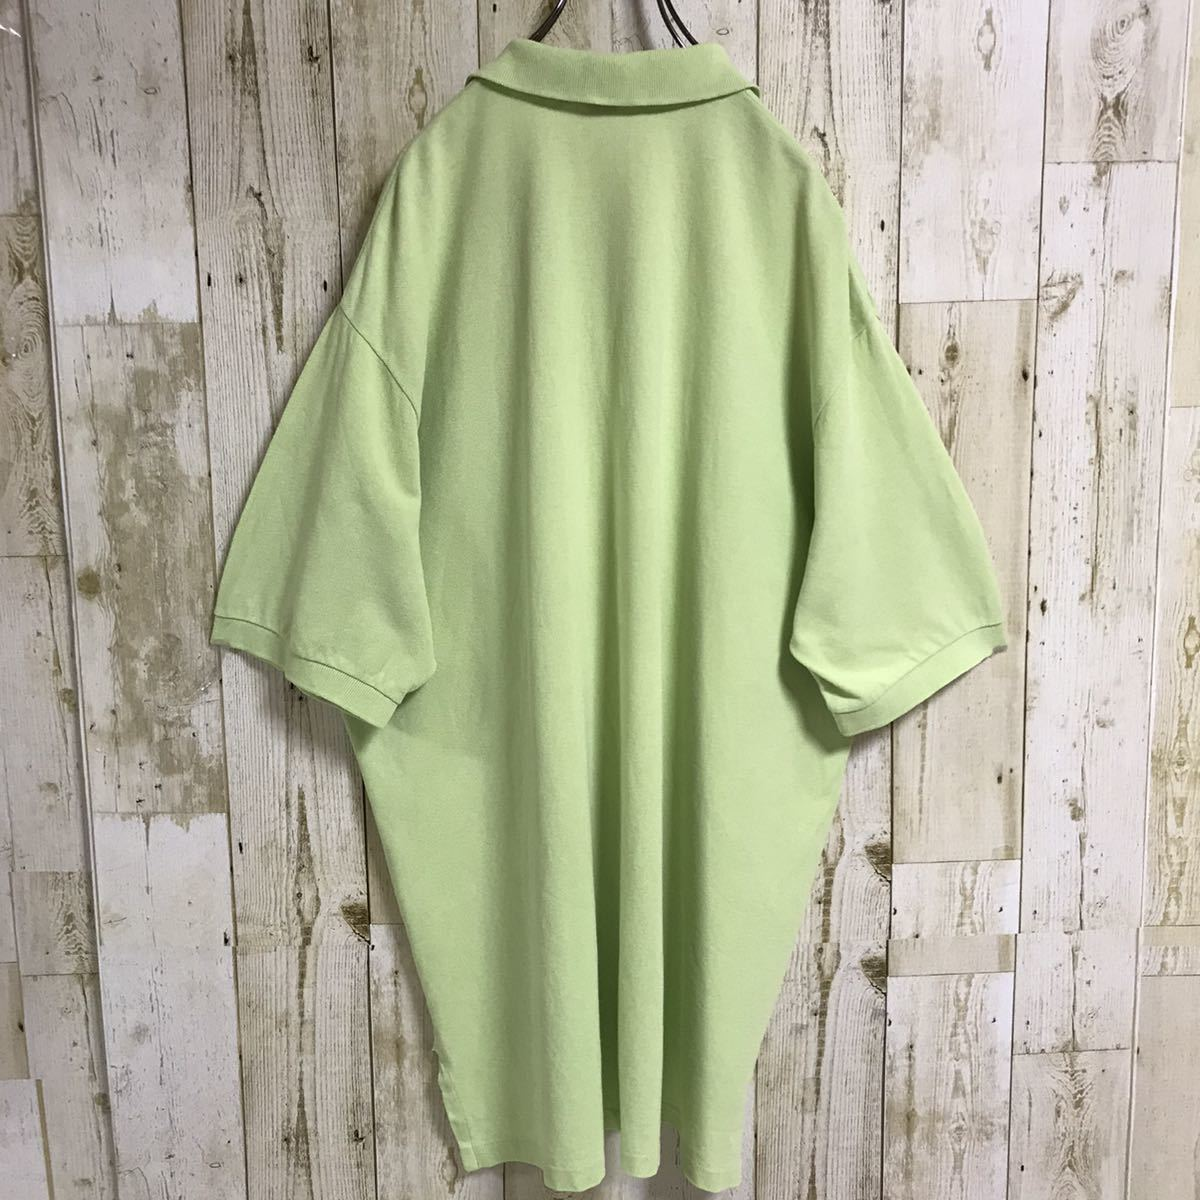 Ralph Lauren ポロバイラルフローレン ポロシャツ 半袖シャツ XL ライムグリーン 刺繍ロゴ ポニー ビッグサイズ オーバーサイズ